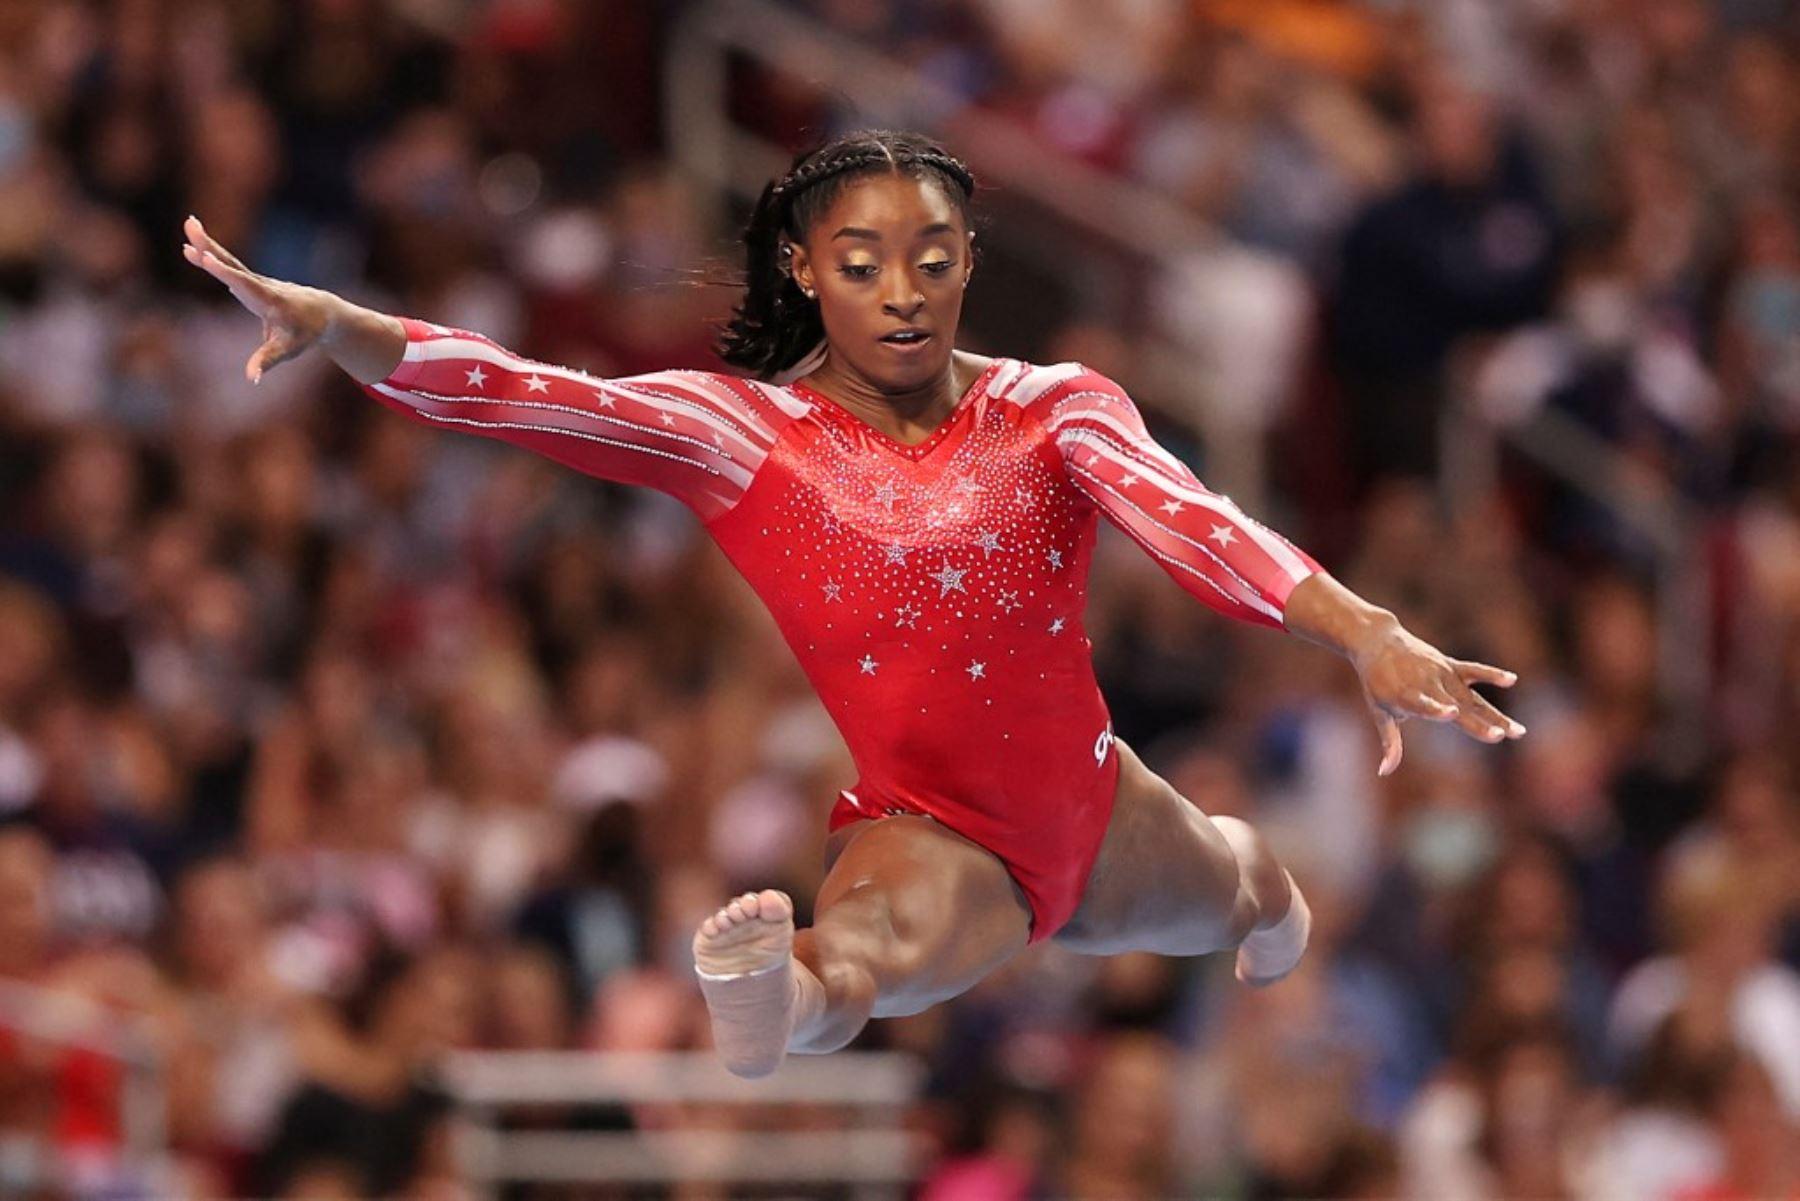 Tokio 2020: Gimnasta Simone Biles no vivirá en la Villa Olímpica